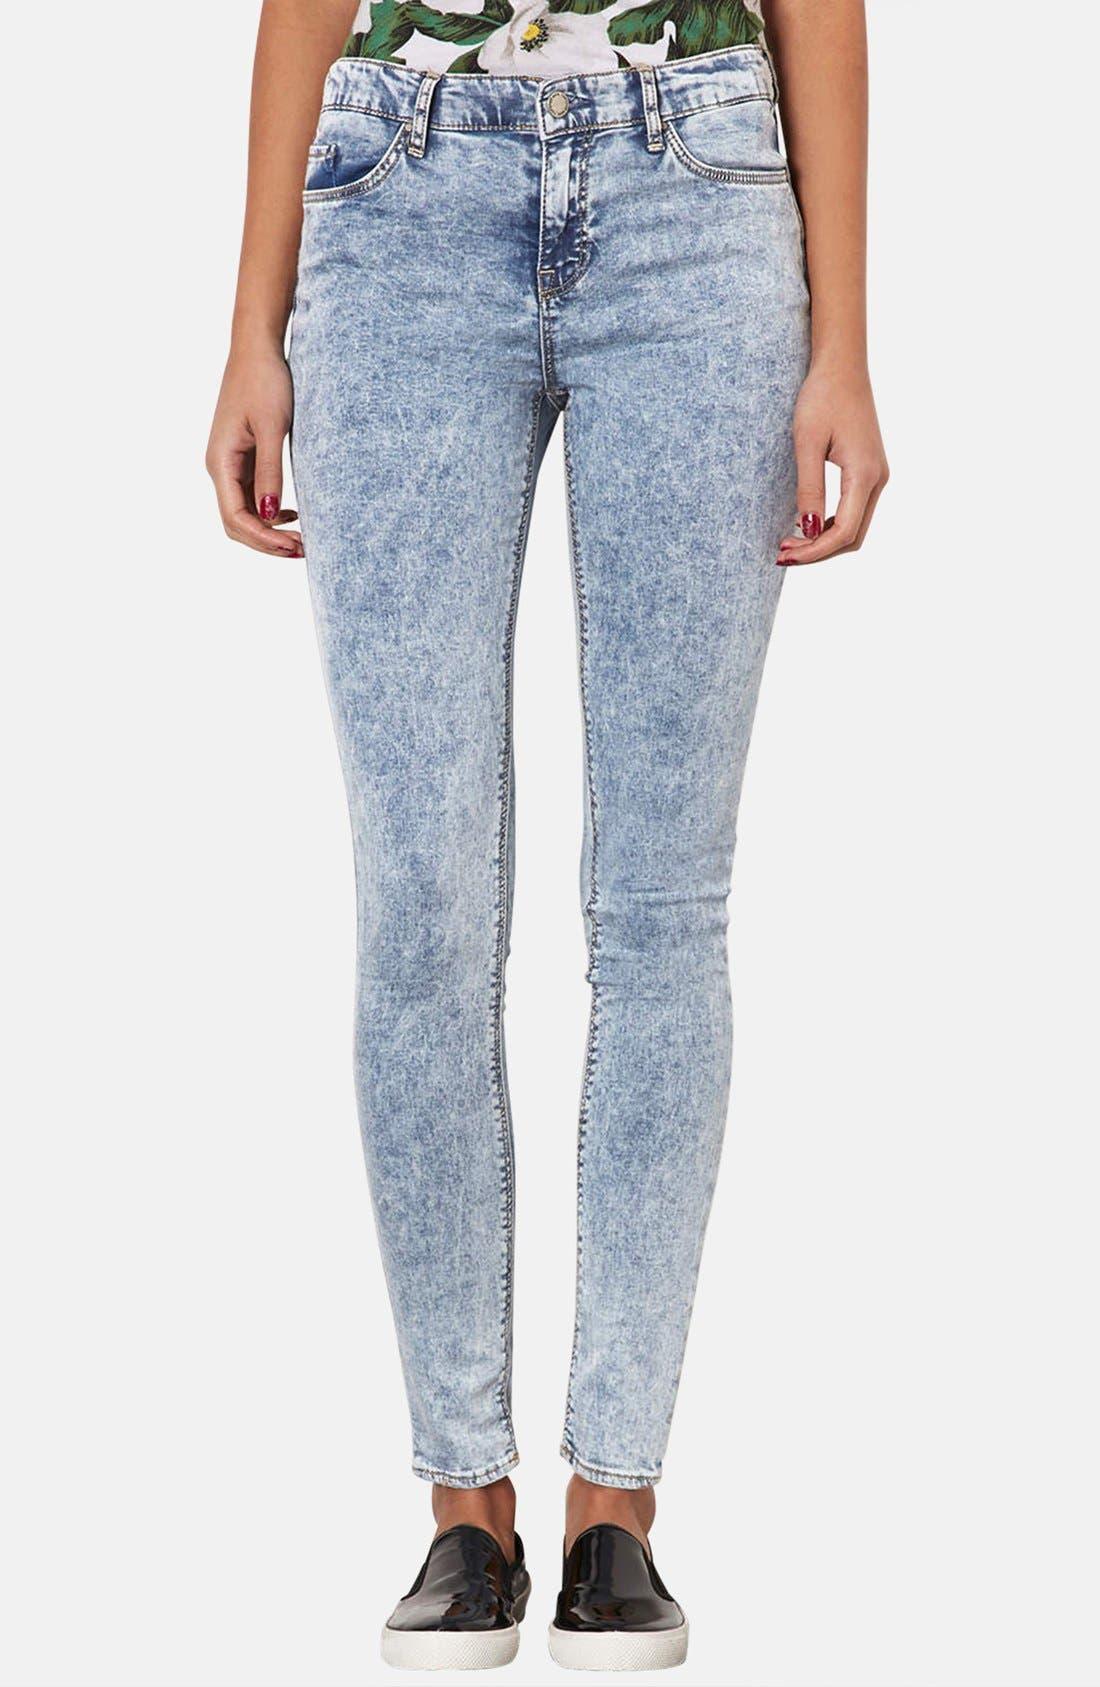 Alternate Image 1 Selected - Topshop Moto 'Leigh' Acid Wash Skinny Jeans (Mid Stone) (Regular & Short)